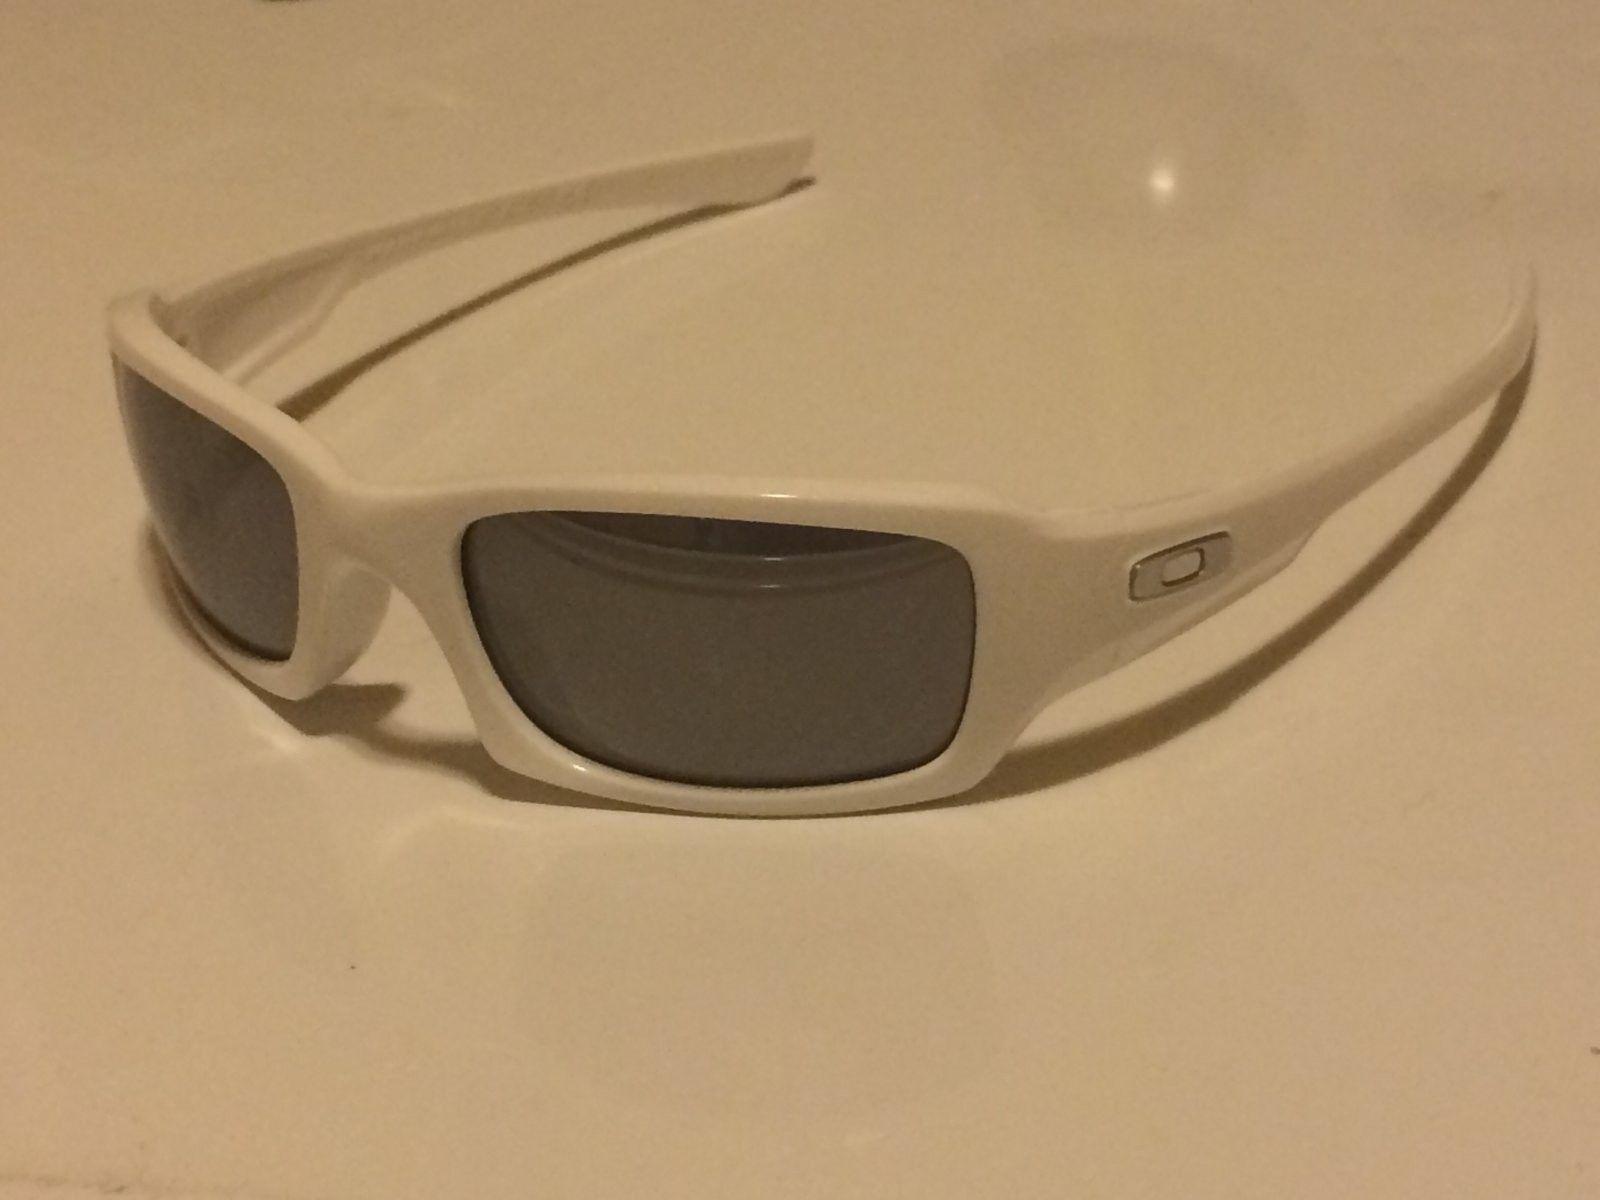 Fives Squared Polished White Black Iridium New (Minor Defect) - image.jpg